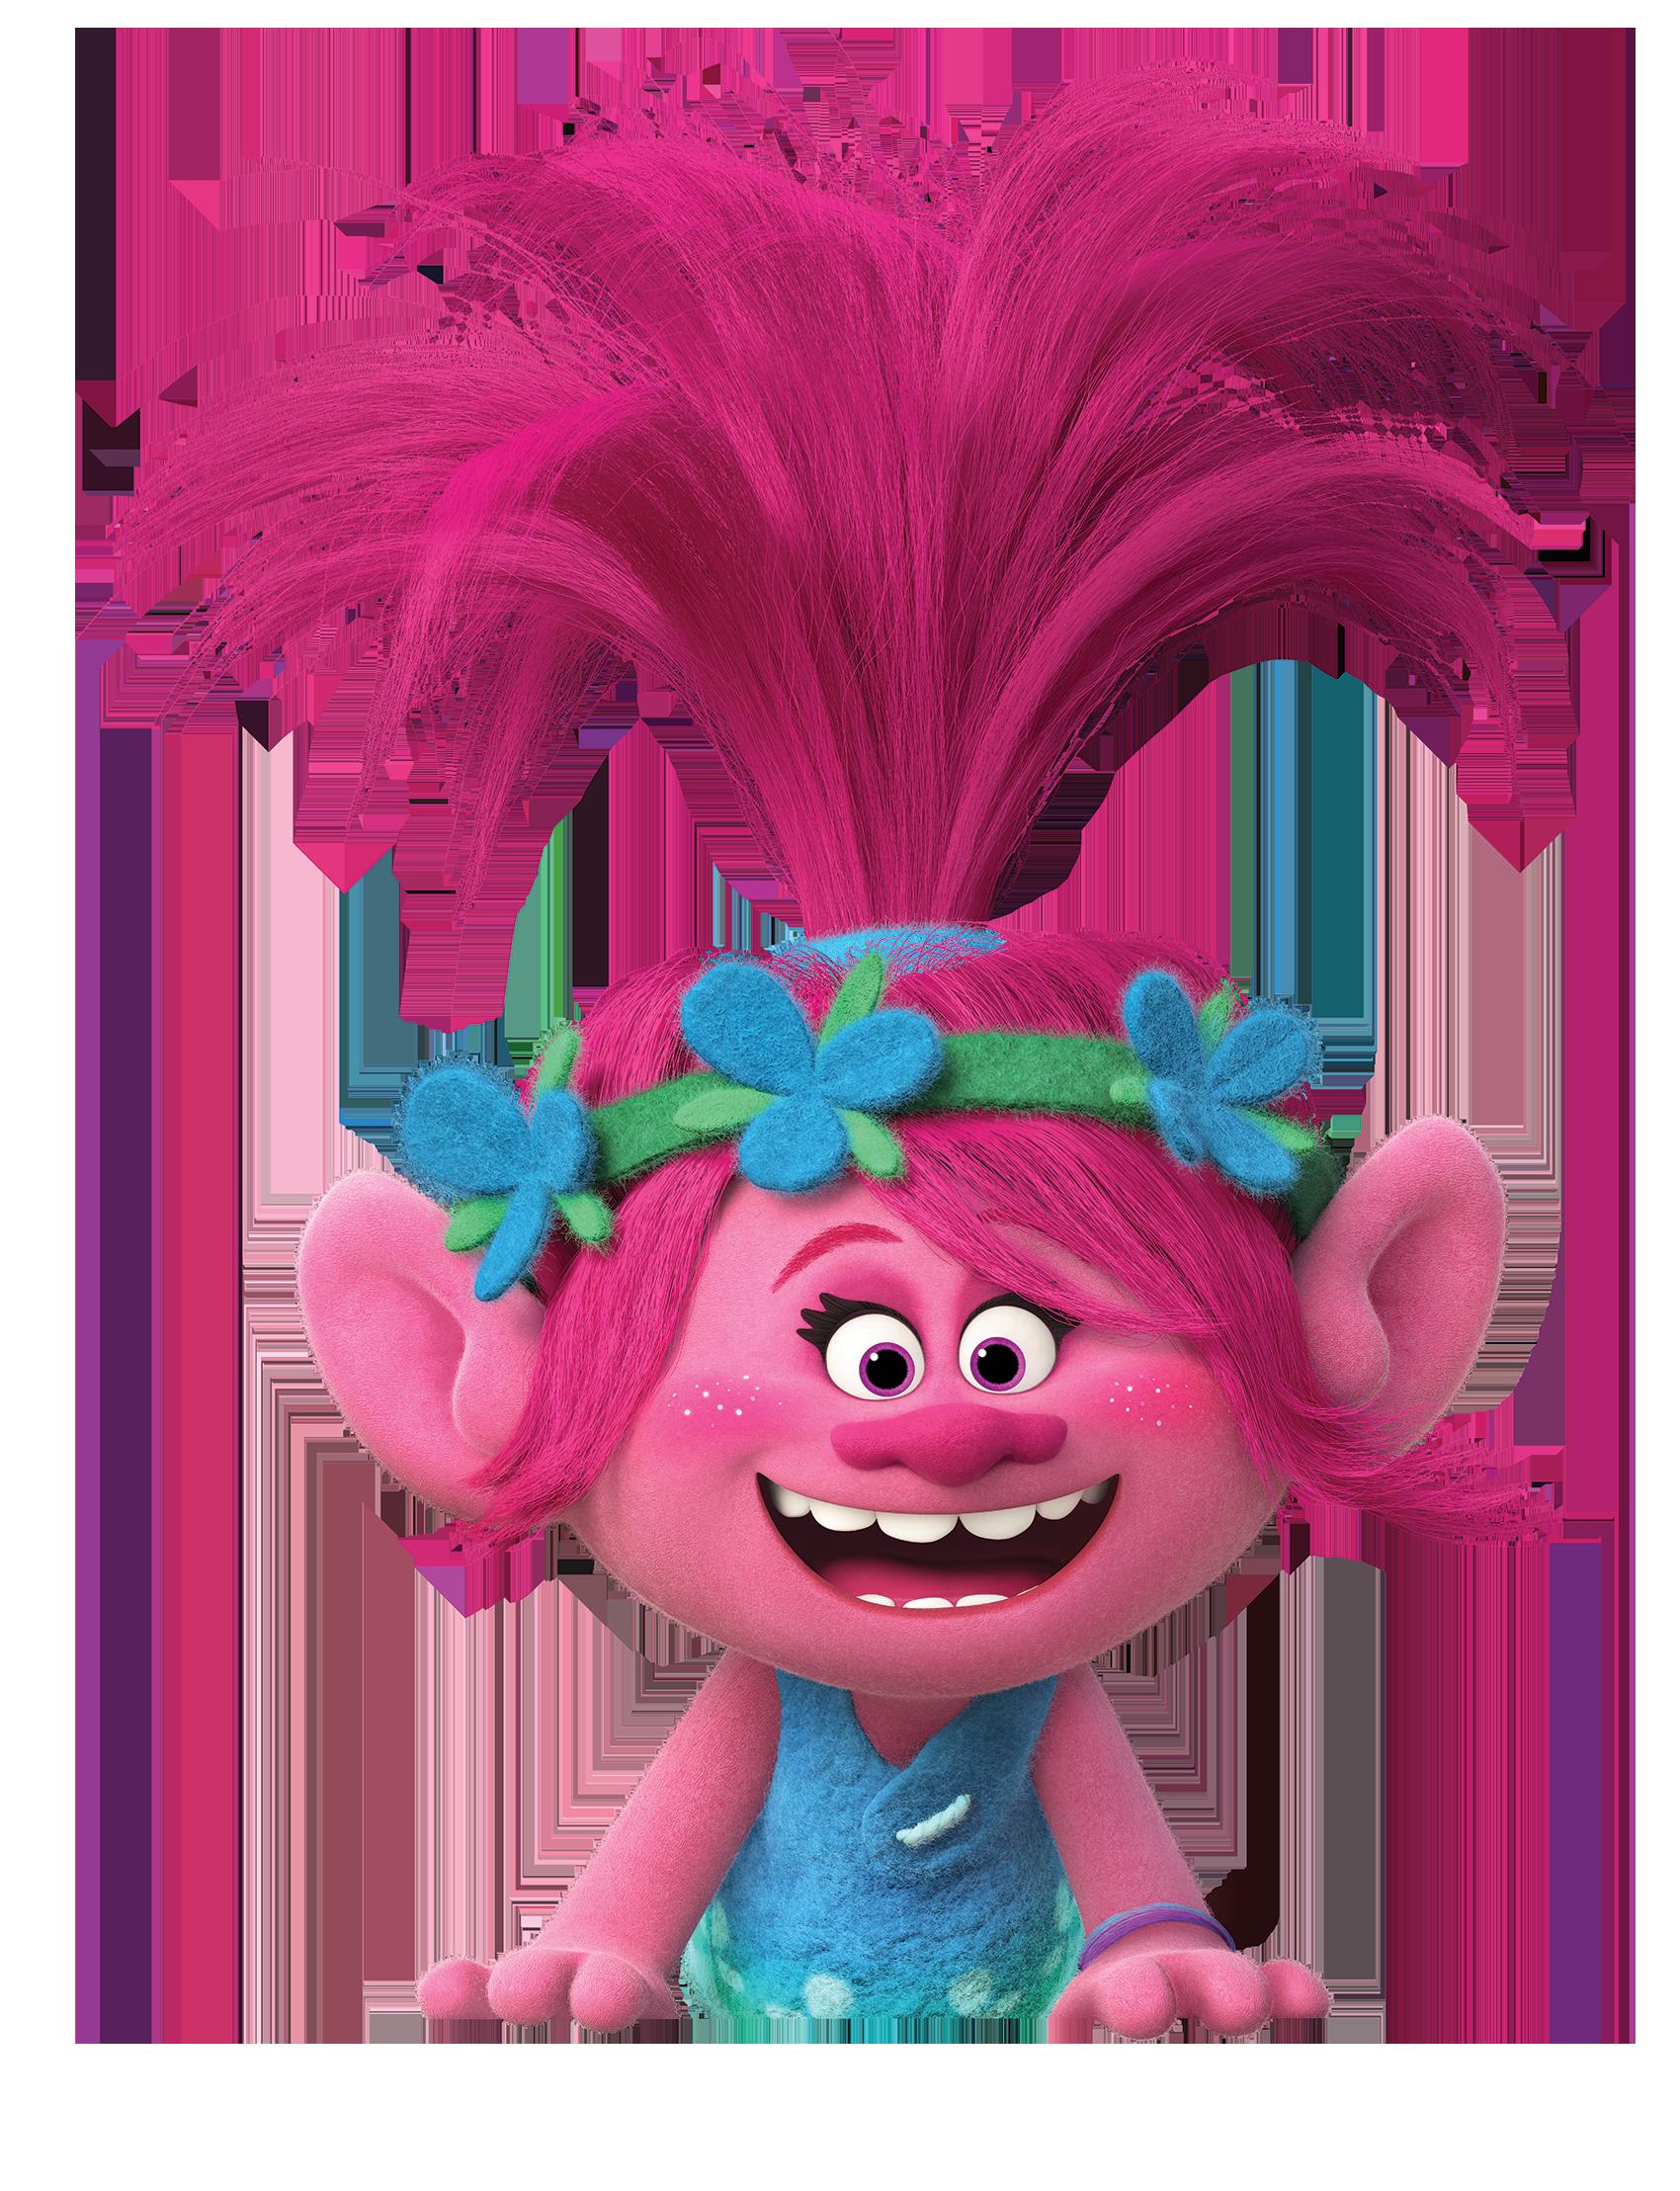 www fhetoolkits com trolls catalog attach downloads celebrate